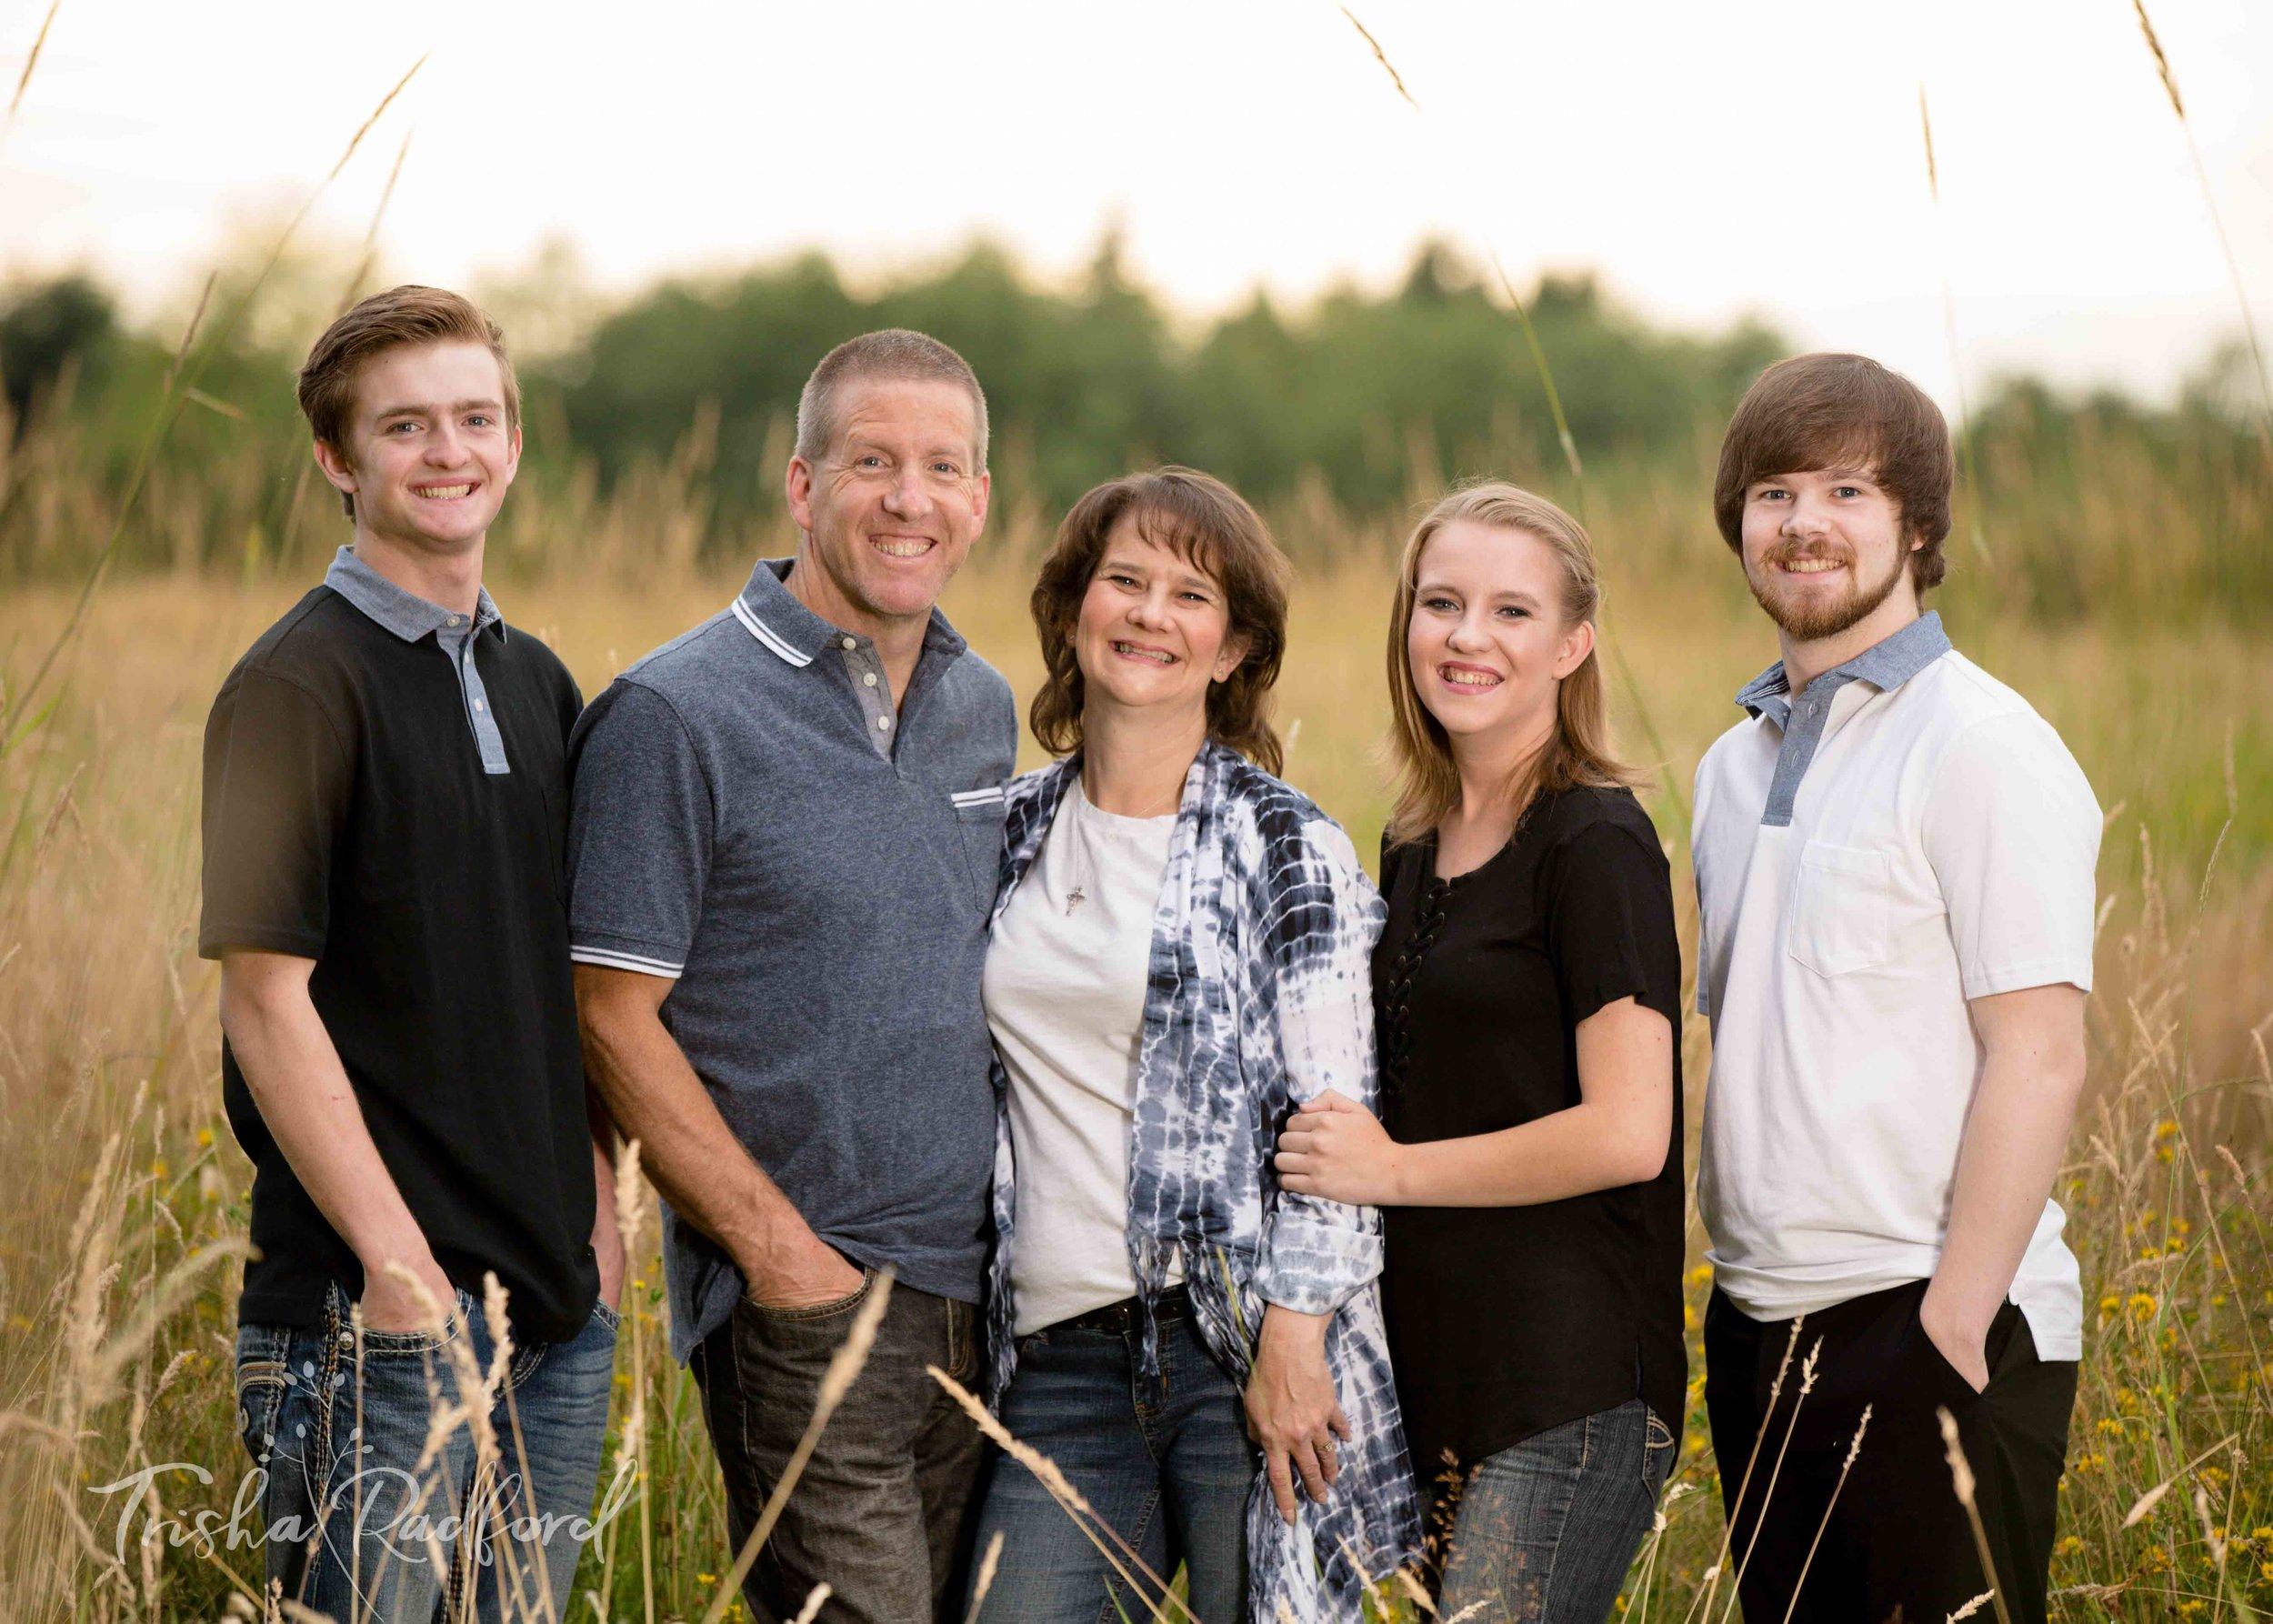 Snohomish County Family Portrait Photographer, Cavelero Hill Park, Lake Stevens WA, Family Photography